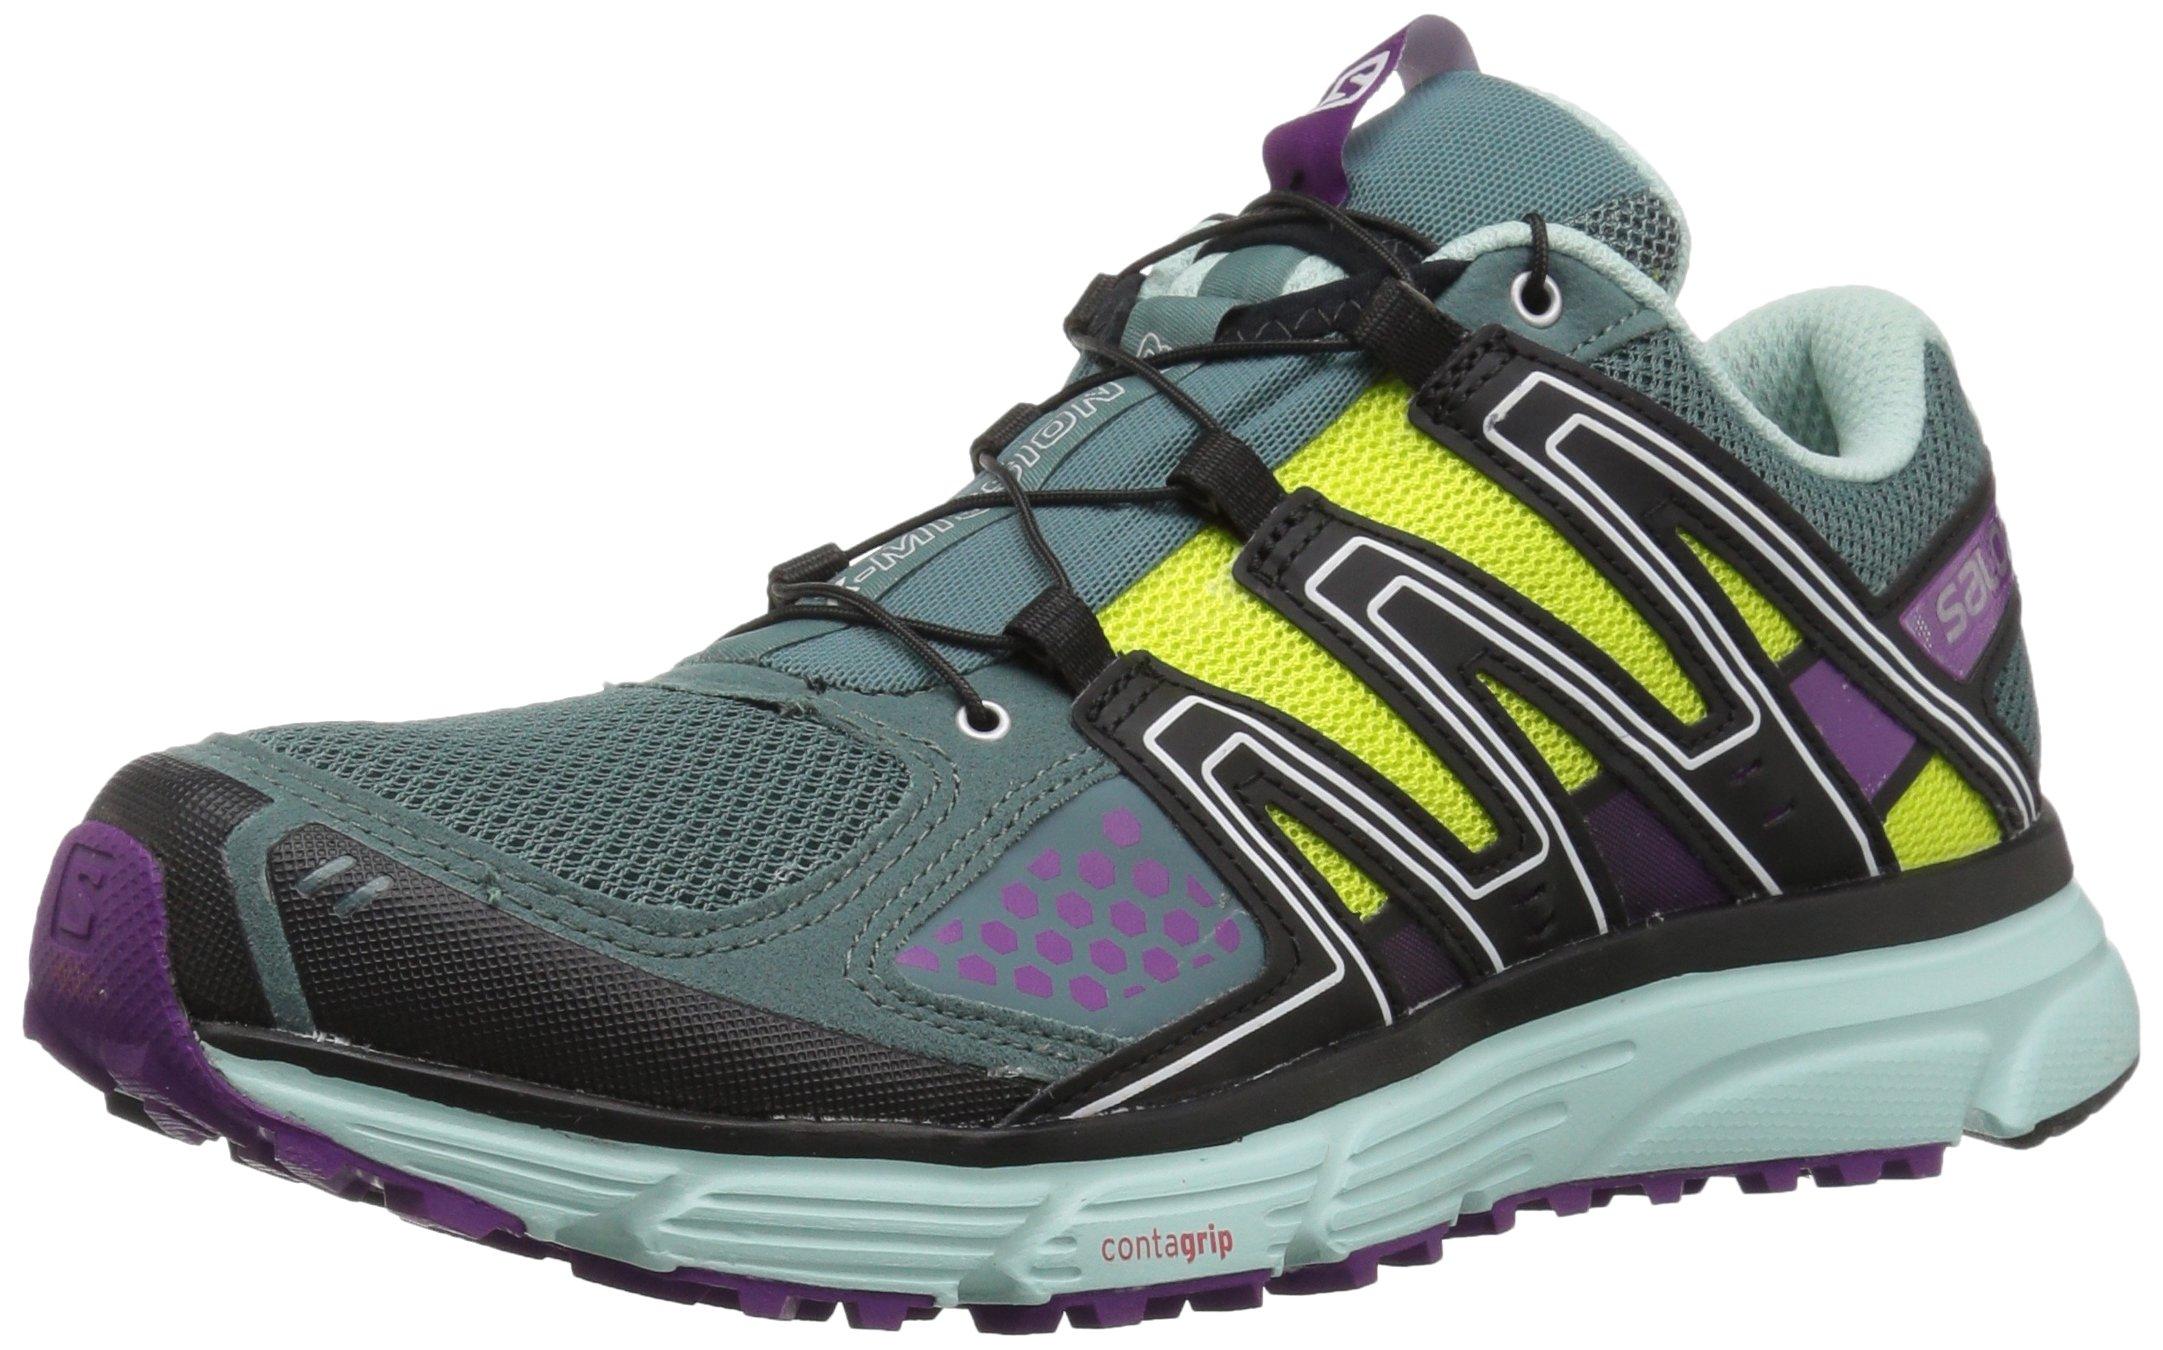 Salomon Women's X-Mission 3W Trail Running Shoe, North Atlantic, 8.5 M US